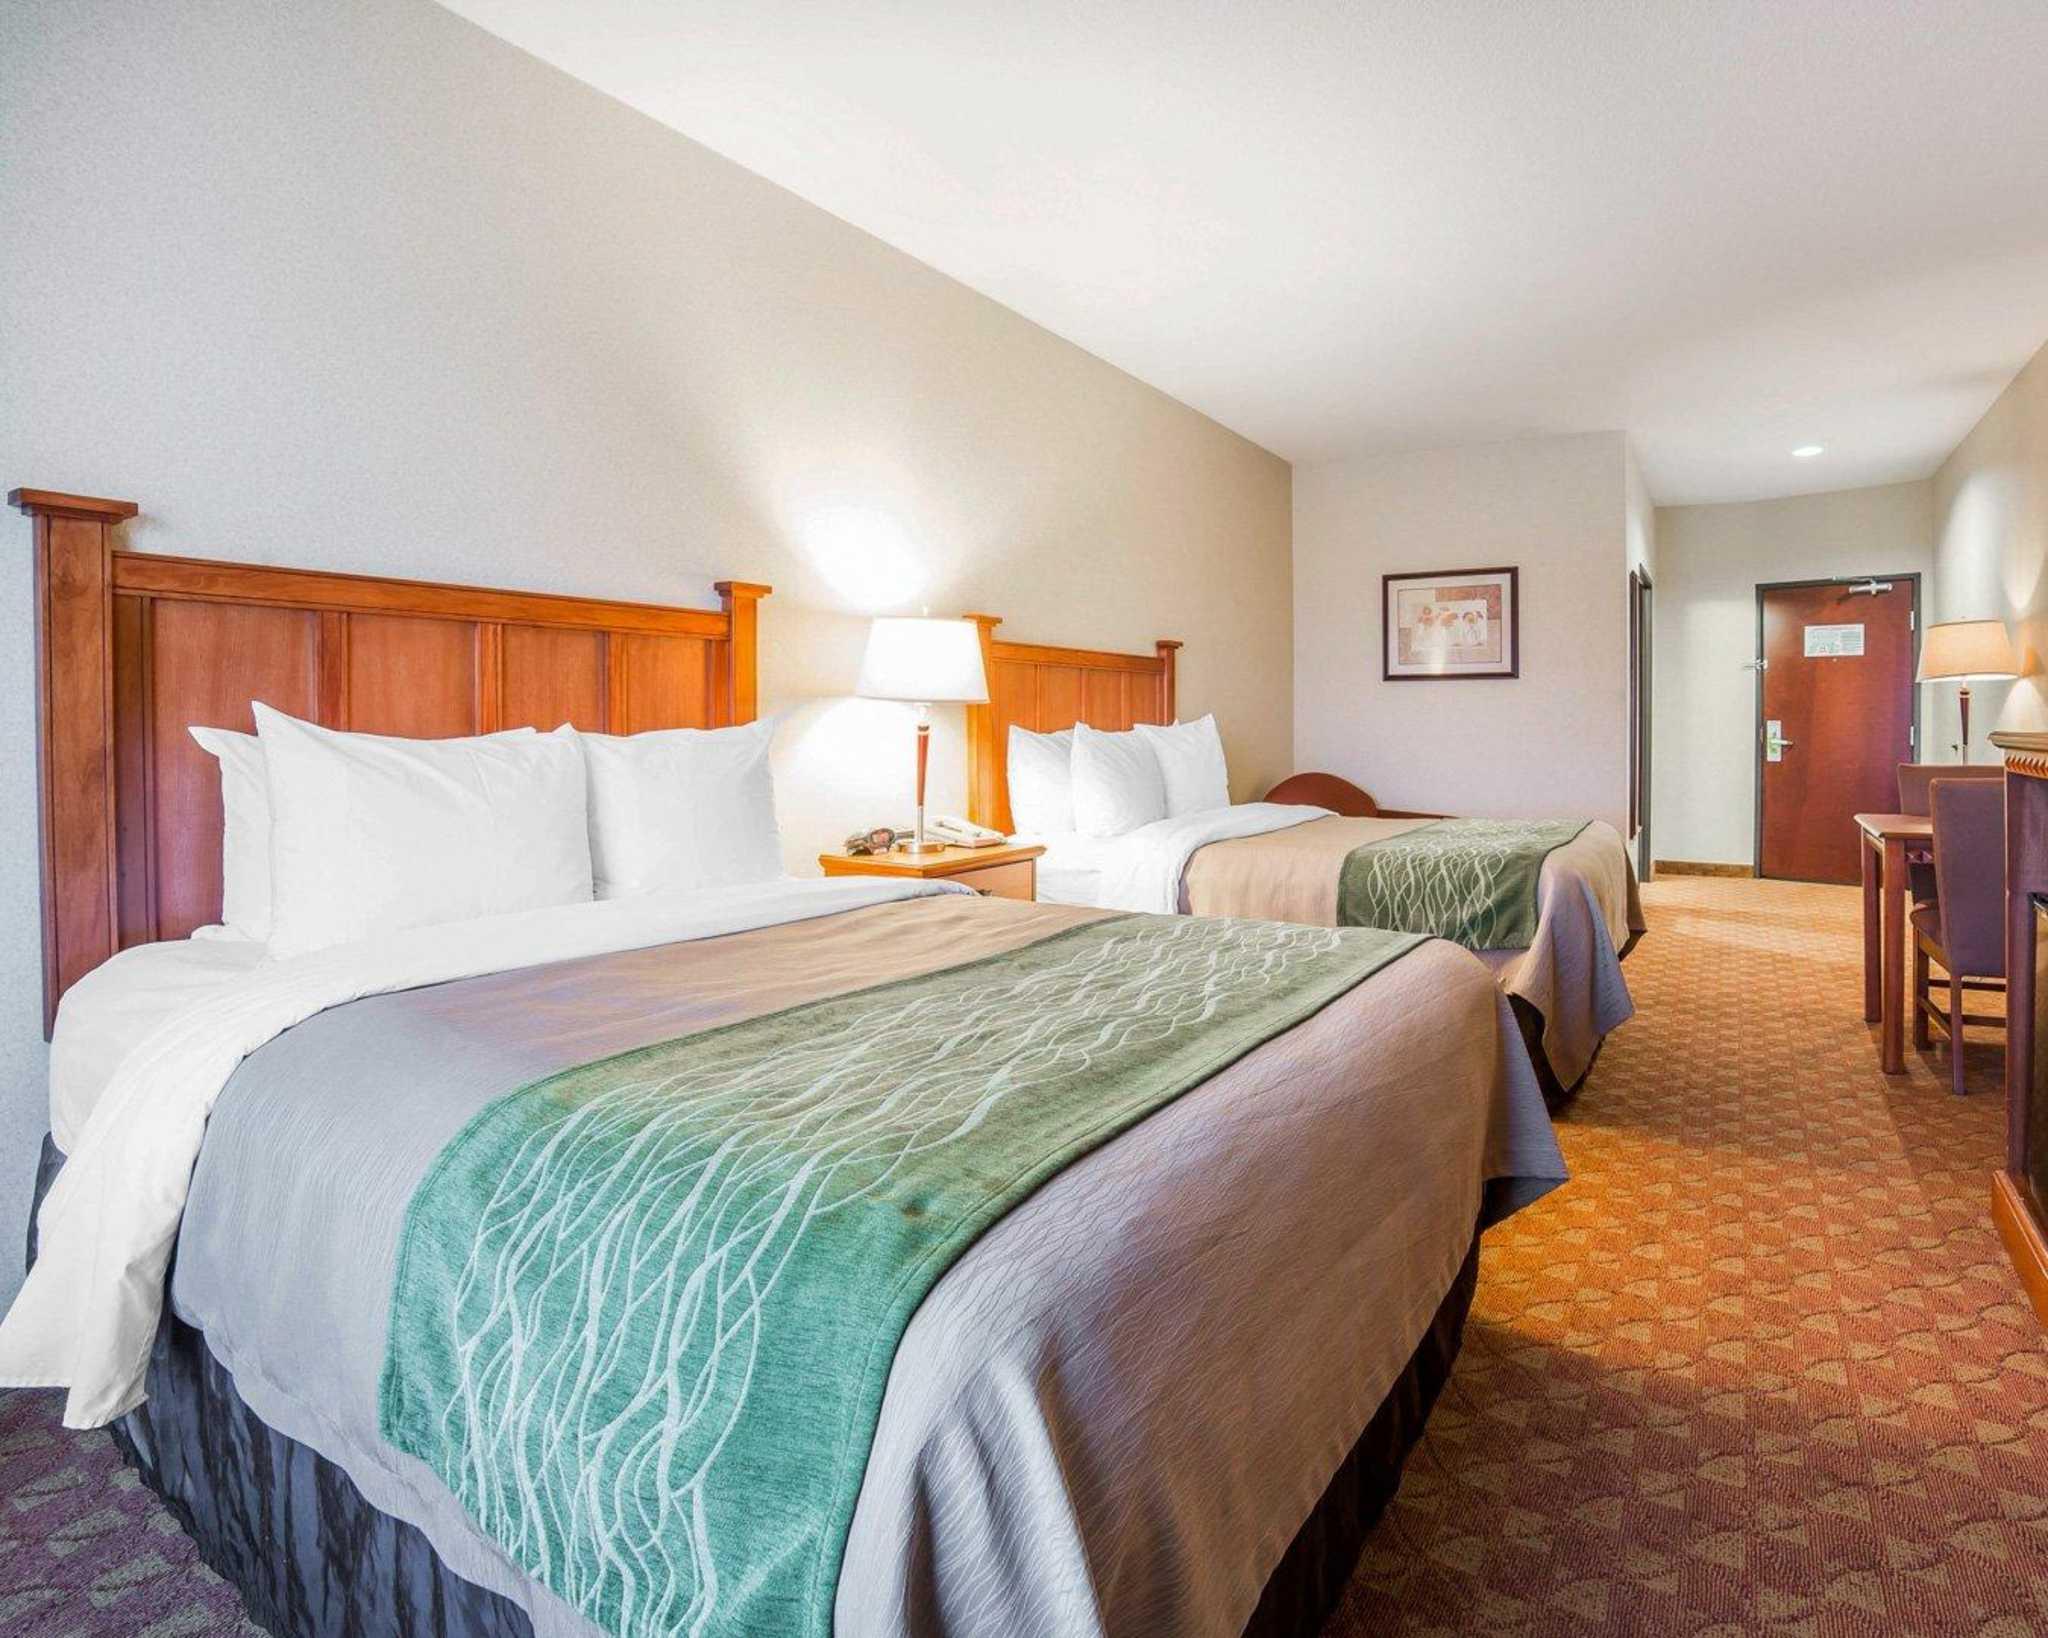 Comfort Inn & Suites Las Vegas - Nellis image 11